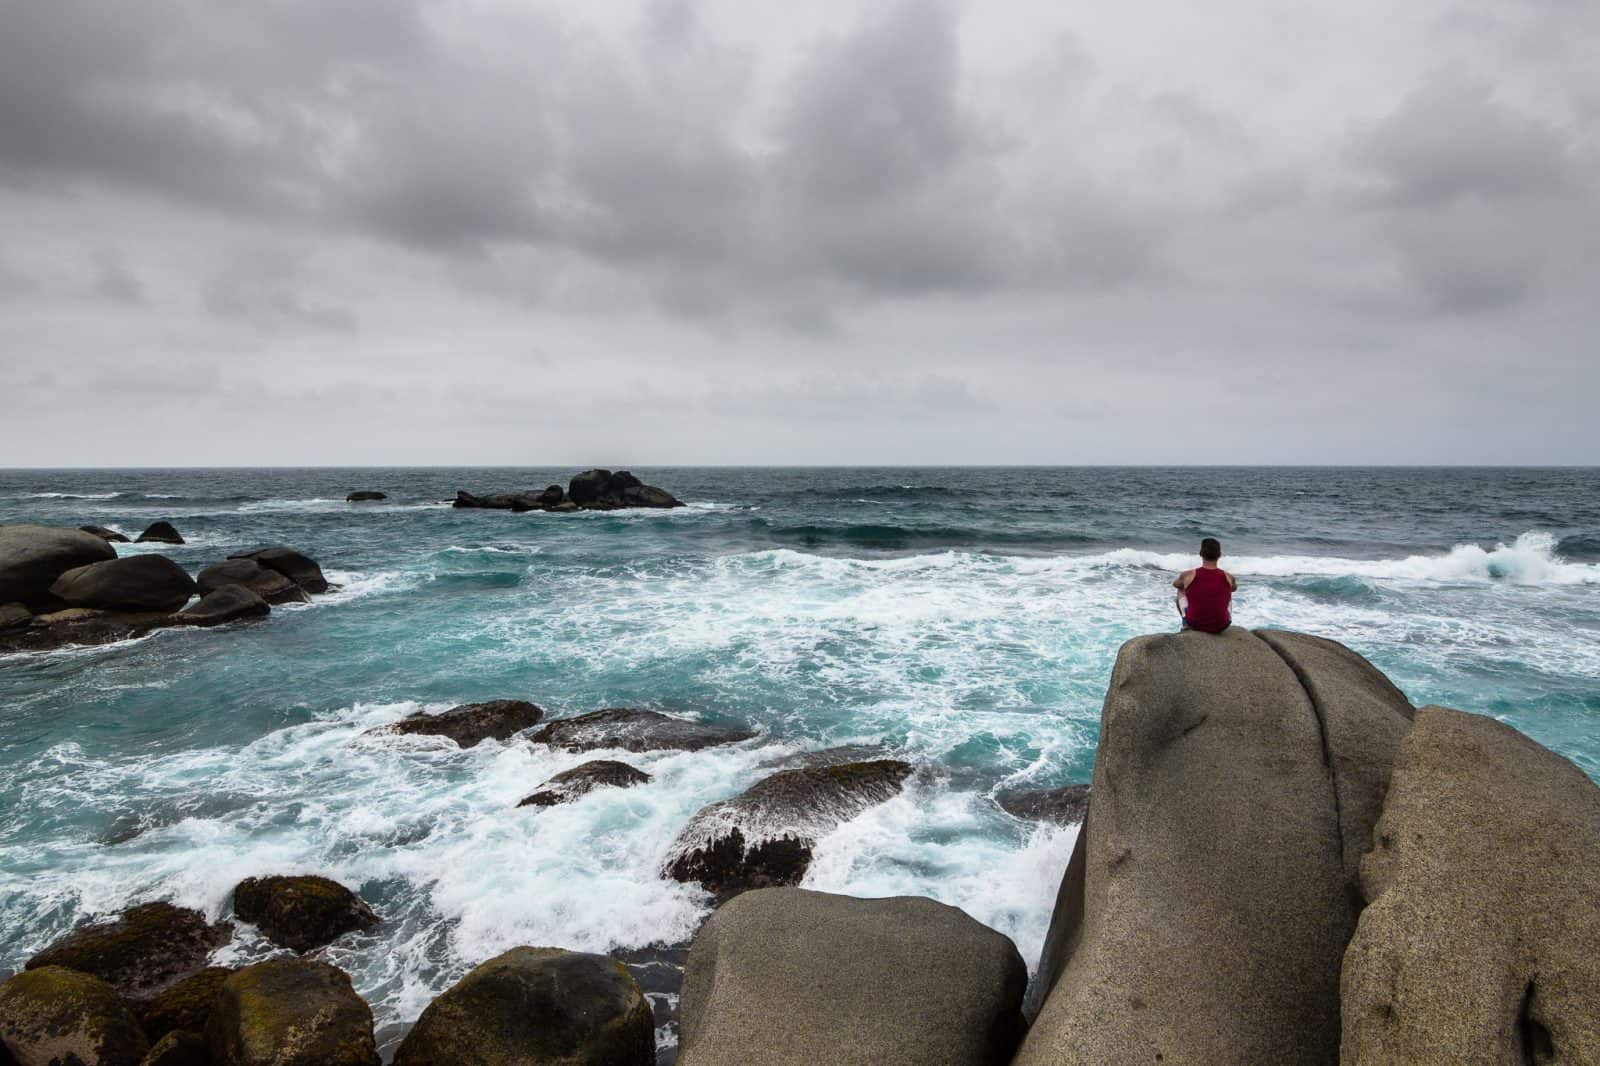 Stormy Caribbean Sea